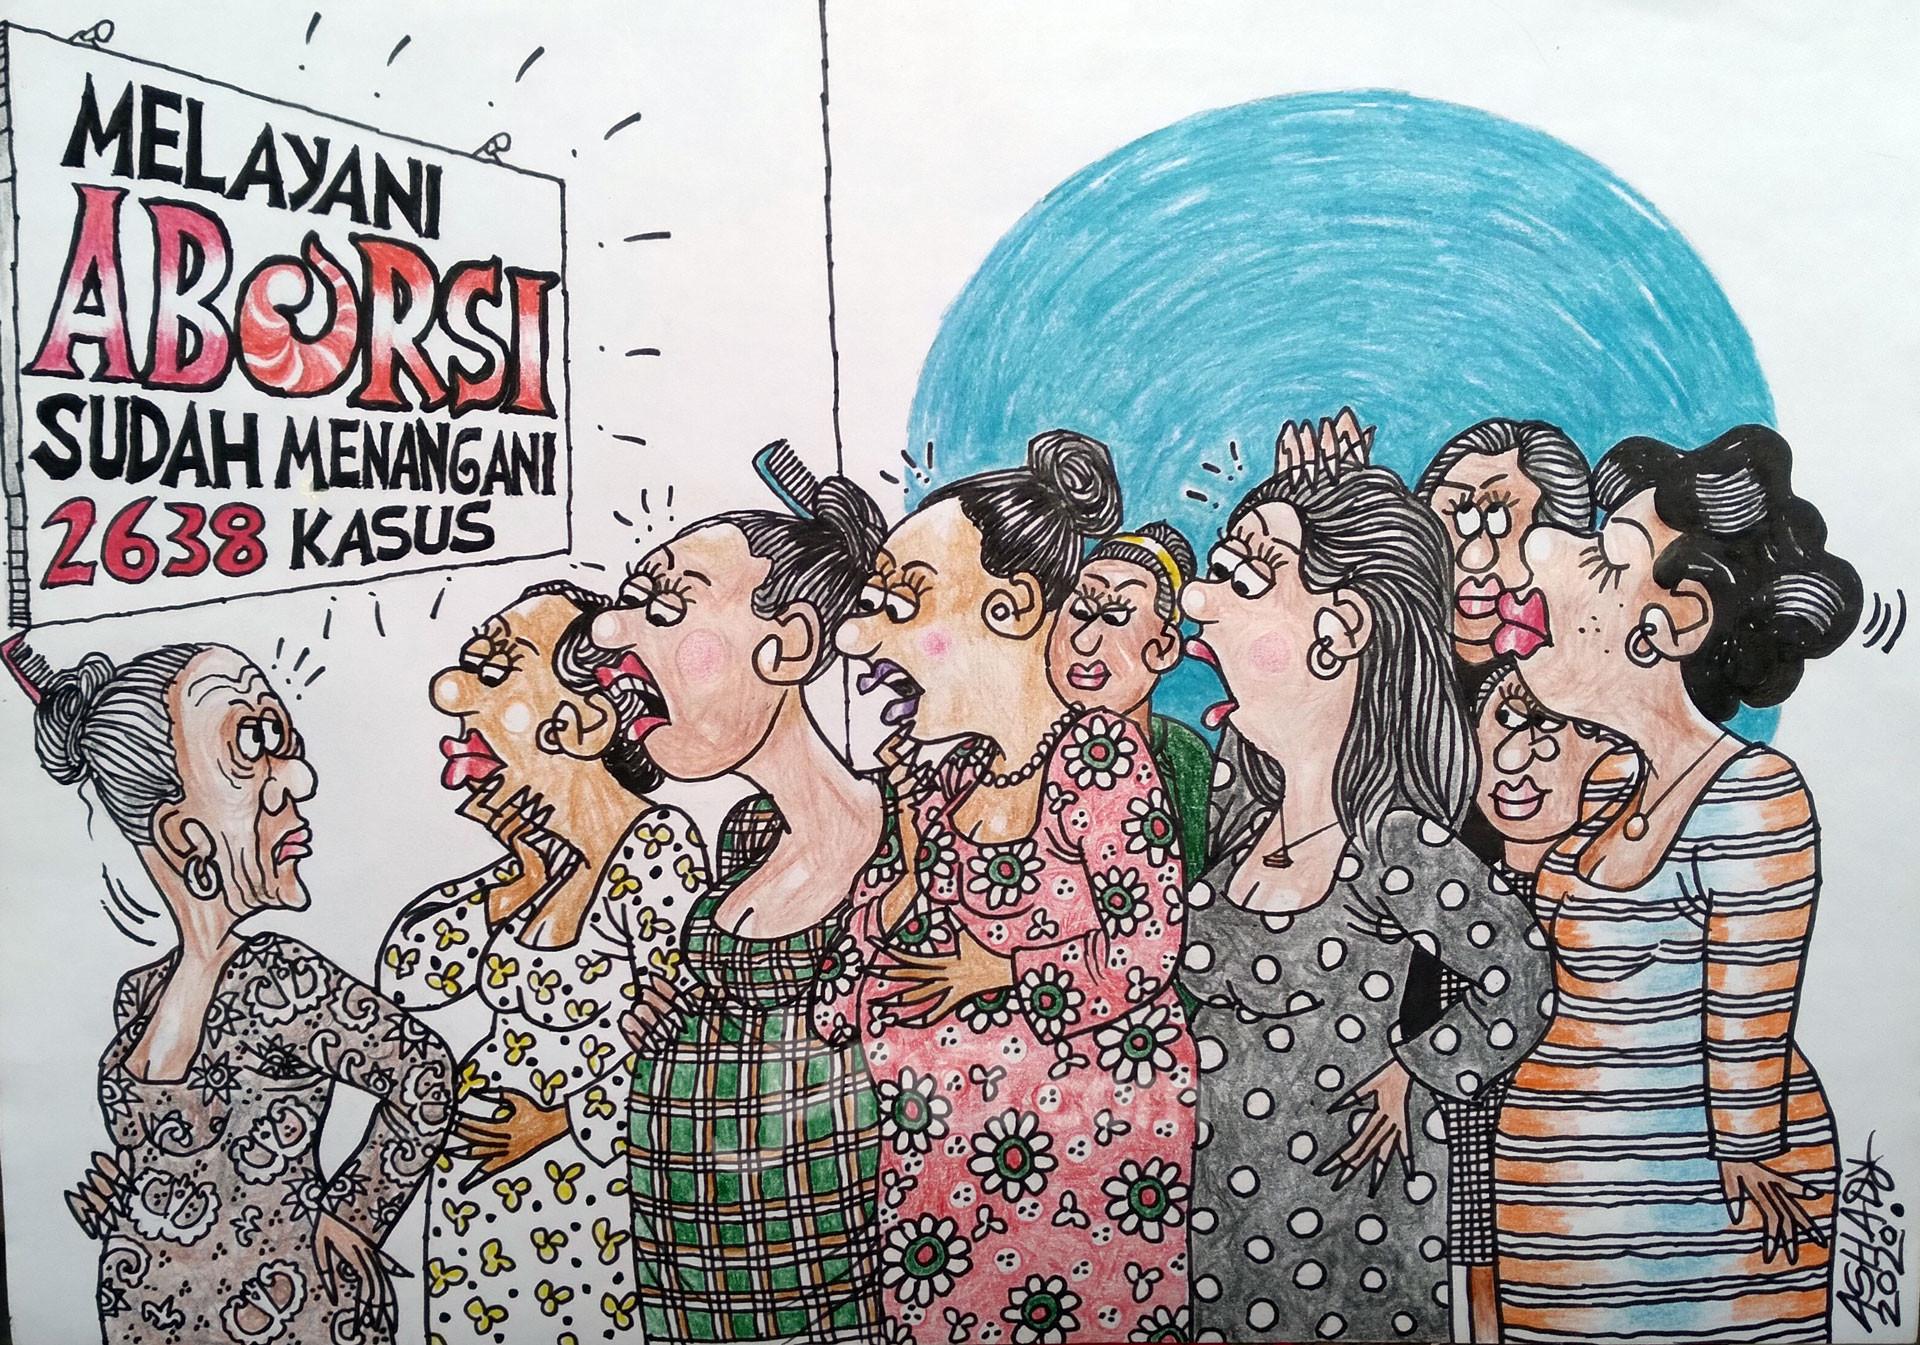 Aborsi. Karikatur oleh Ashady - JPNN.com